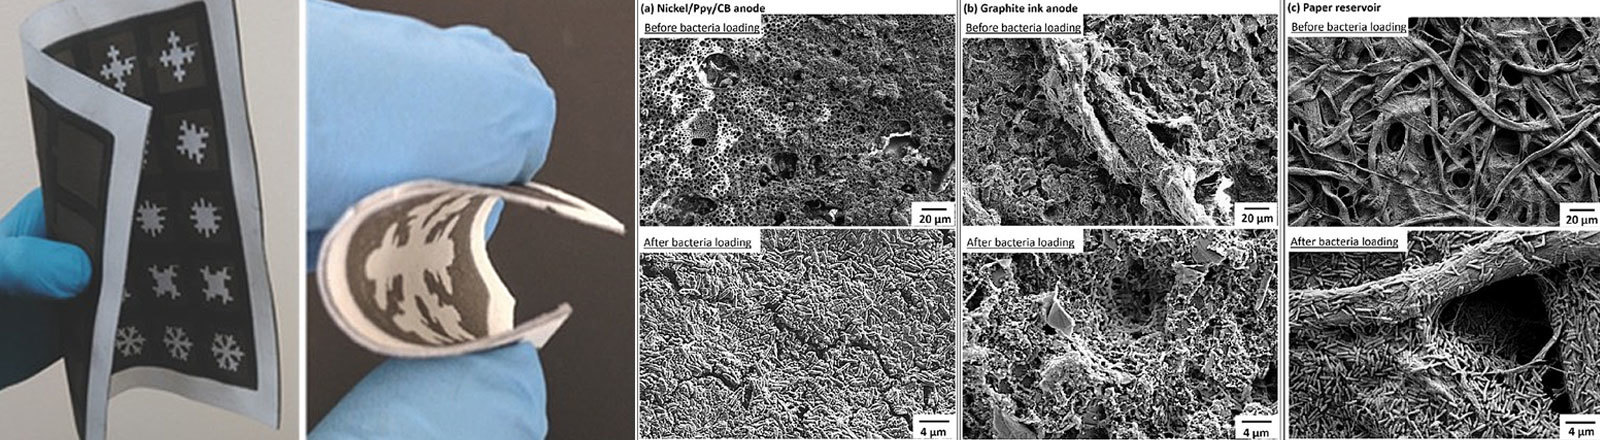 Batterien aus Papier und Bakterien, Grafik